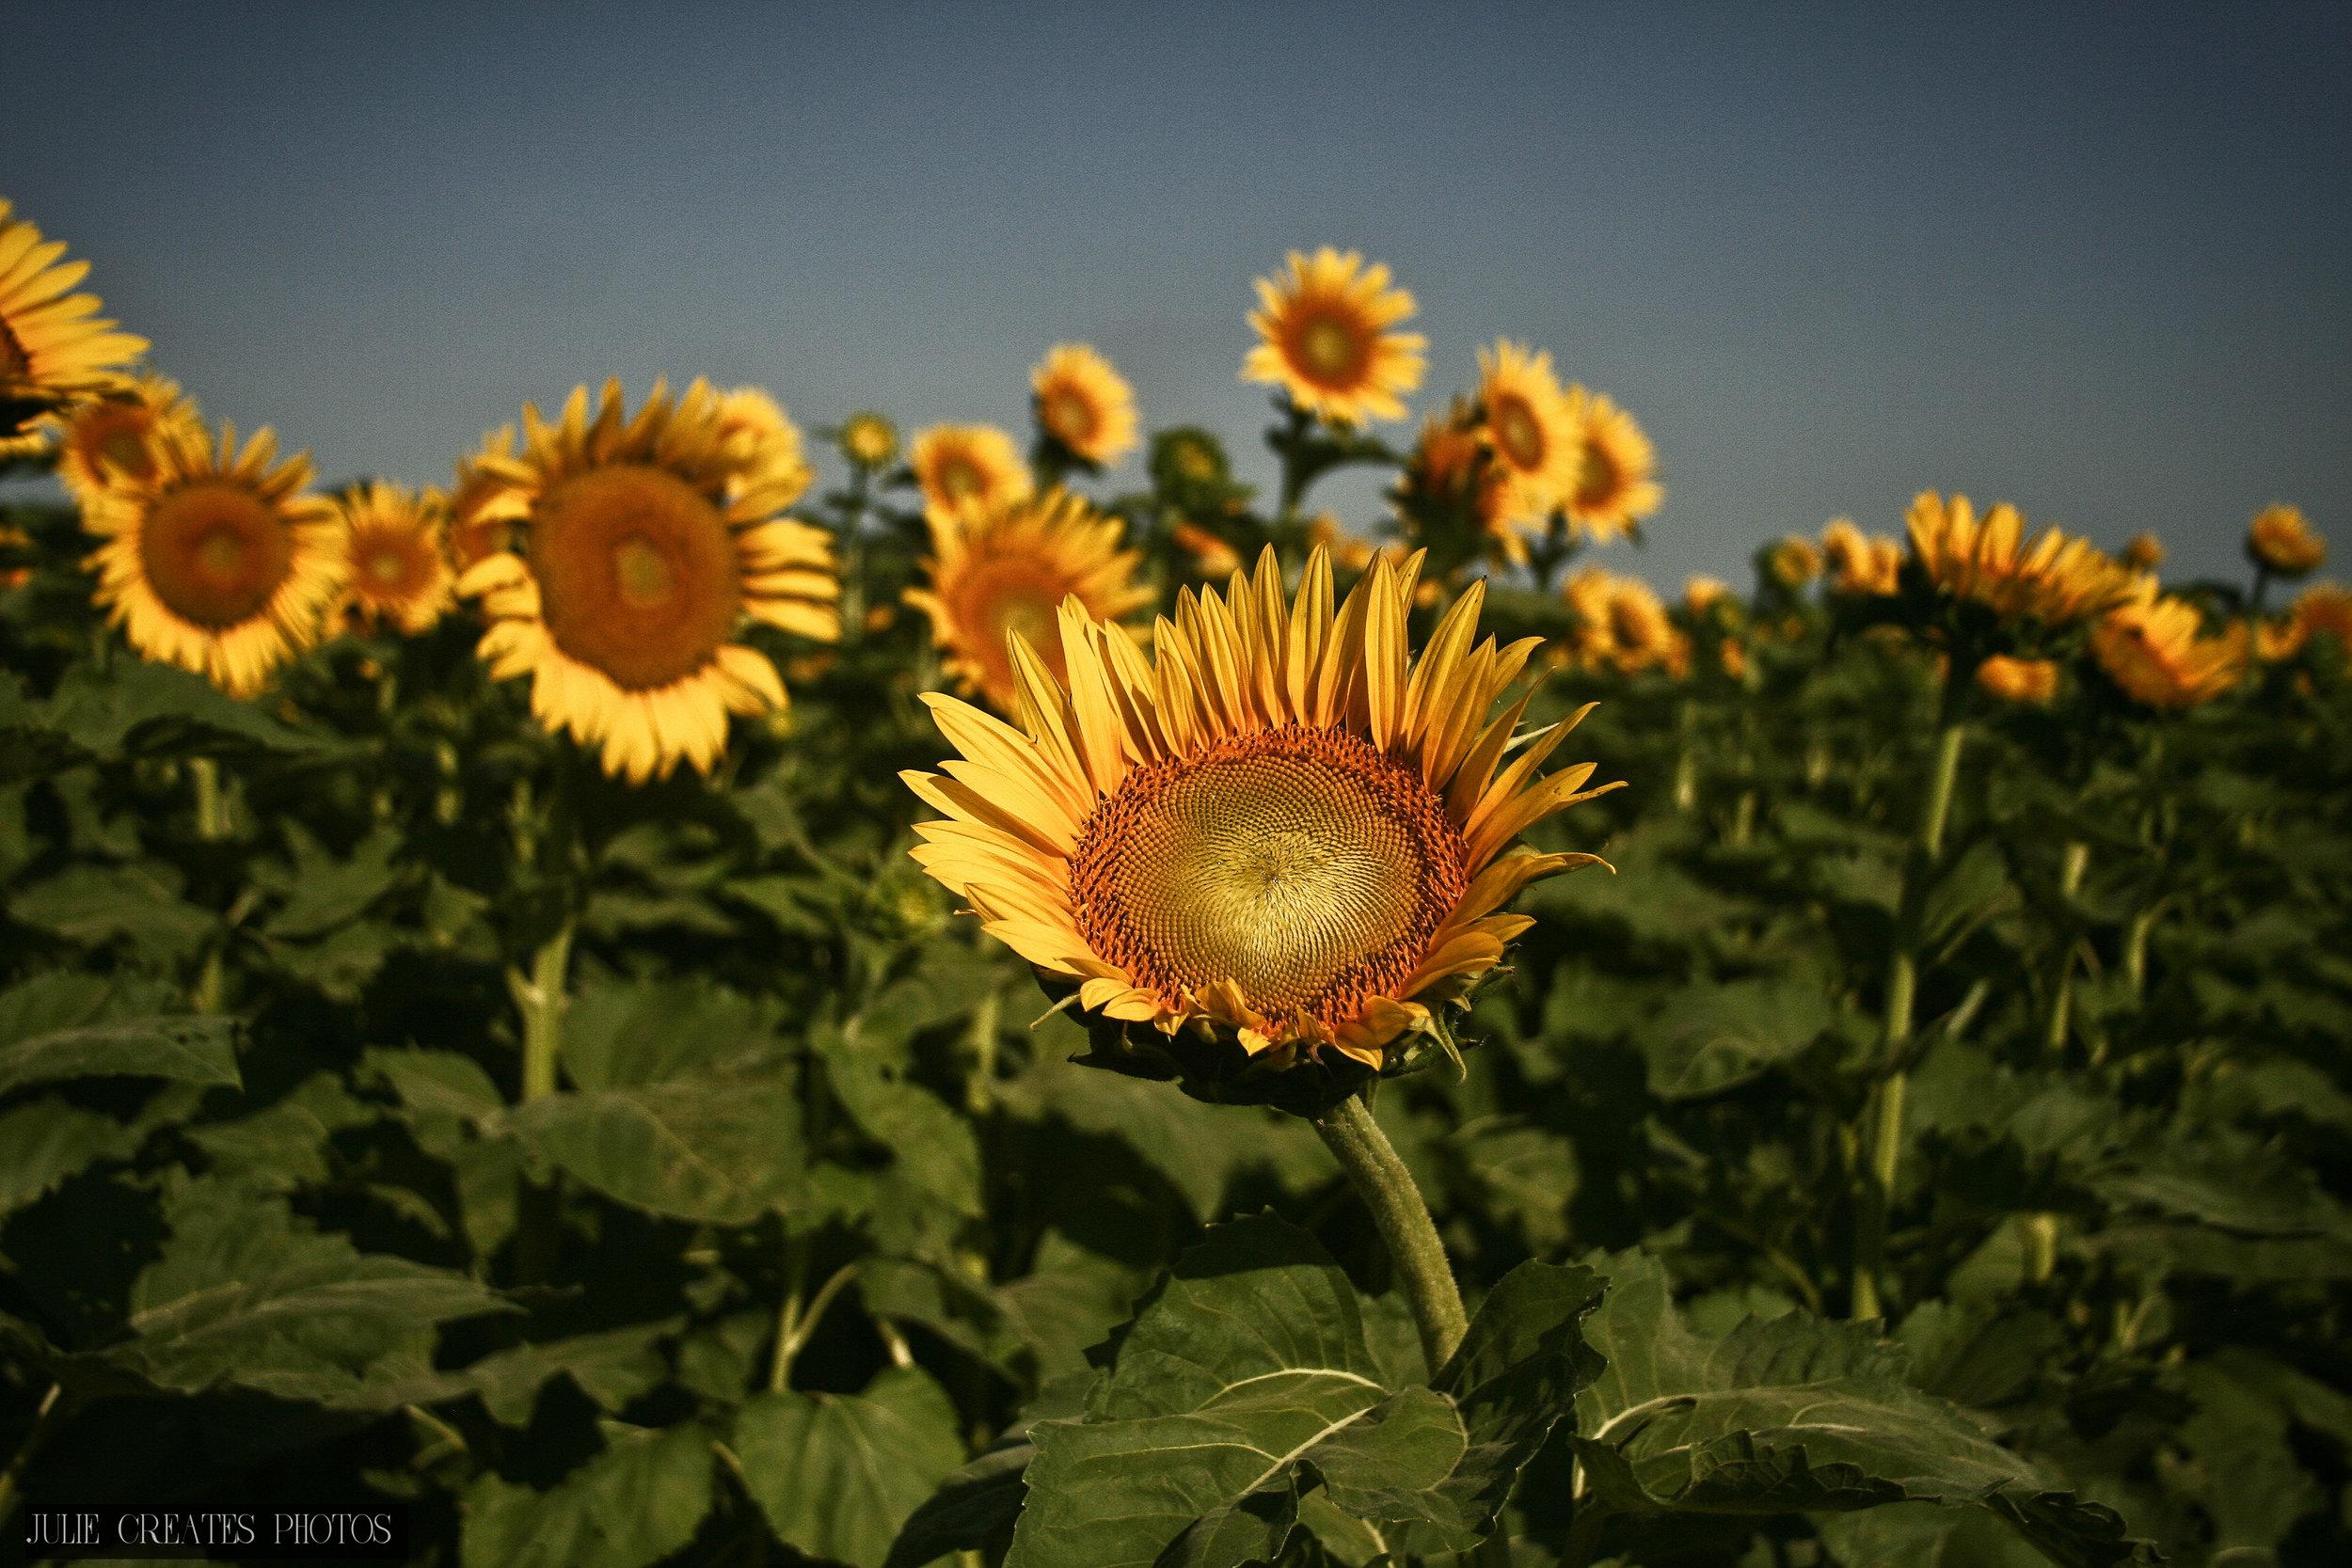 Sunflowers5.jpg